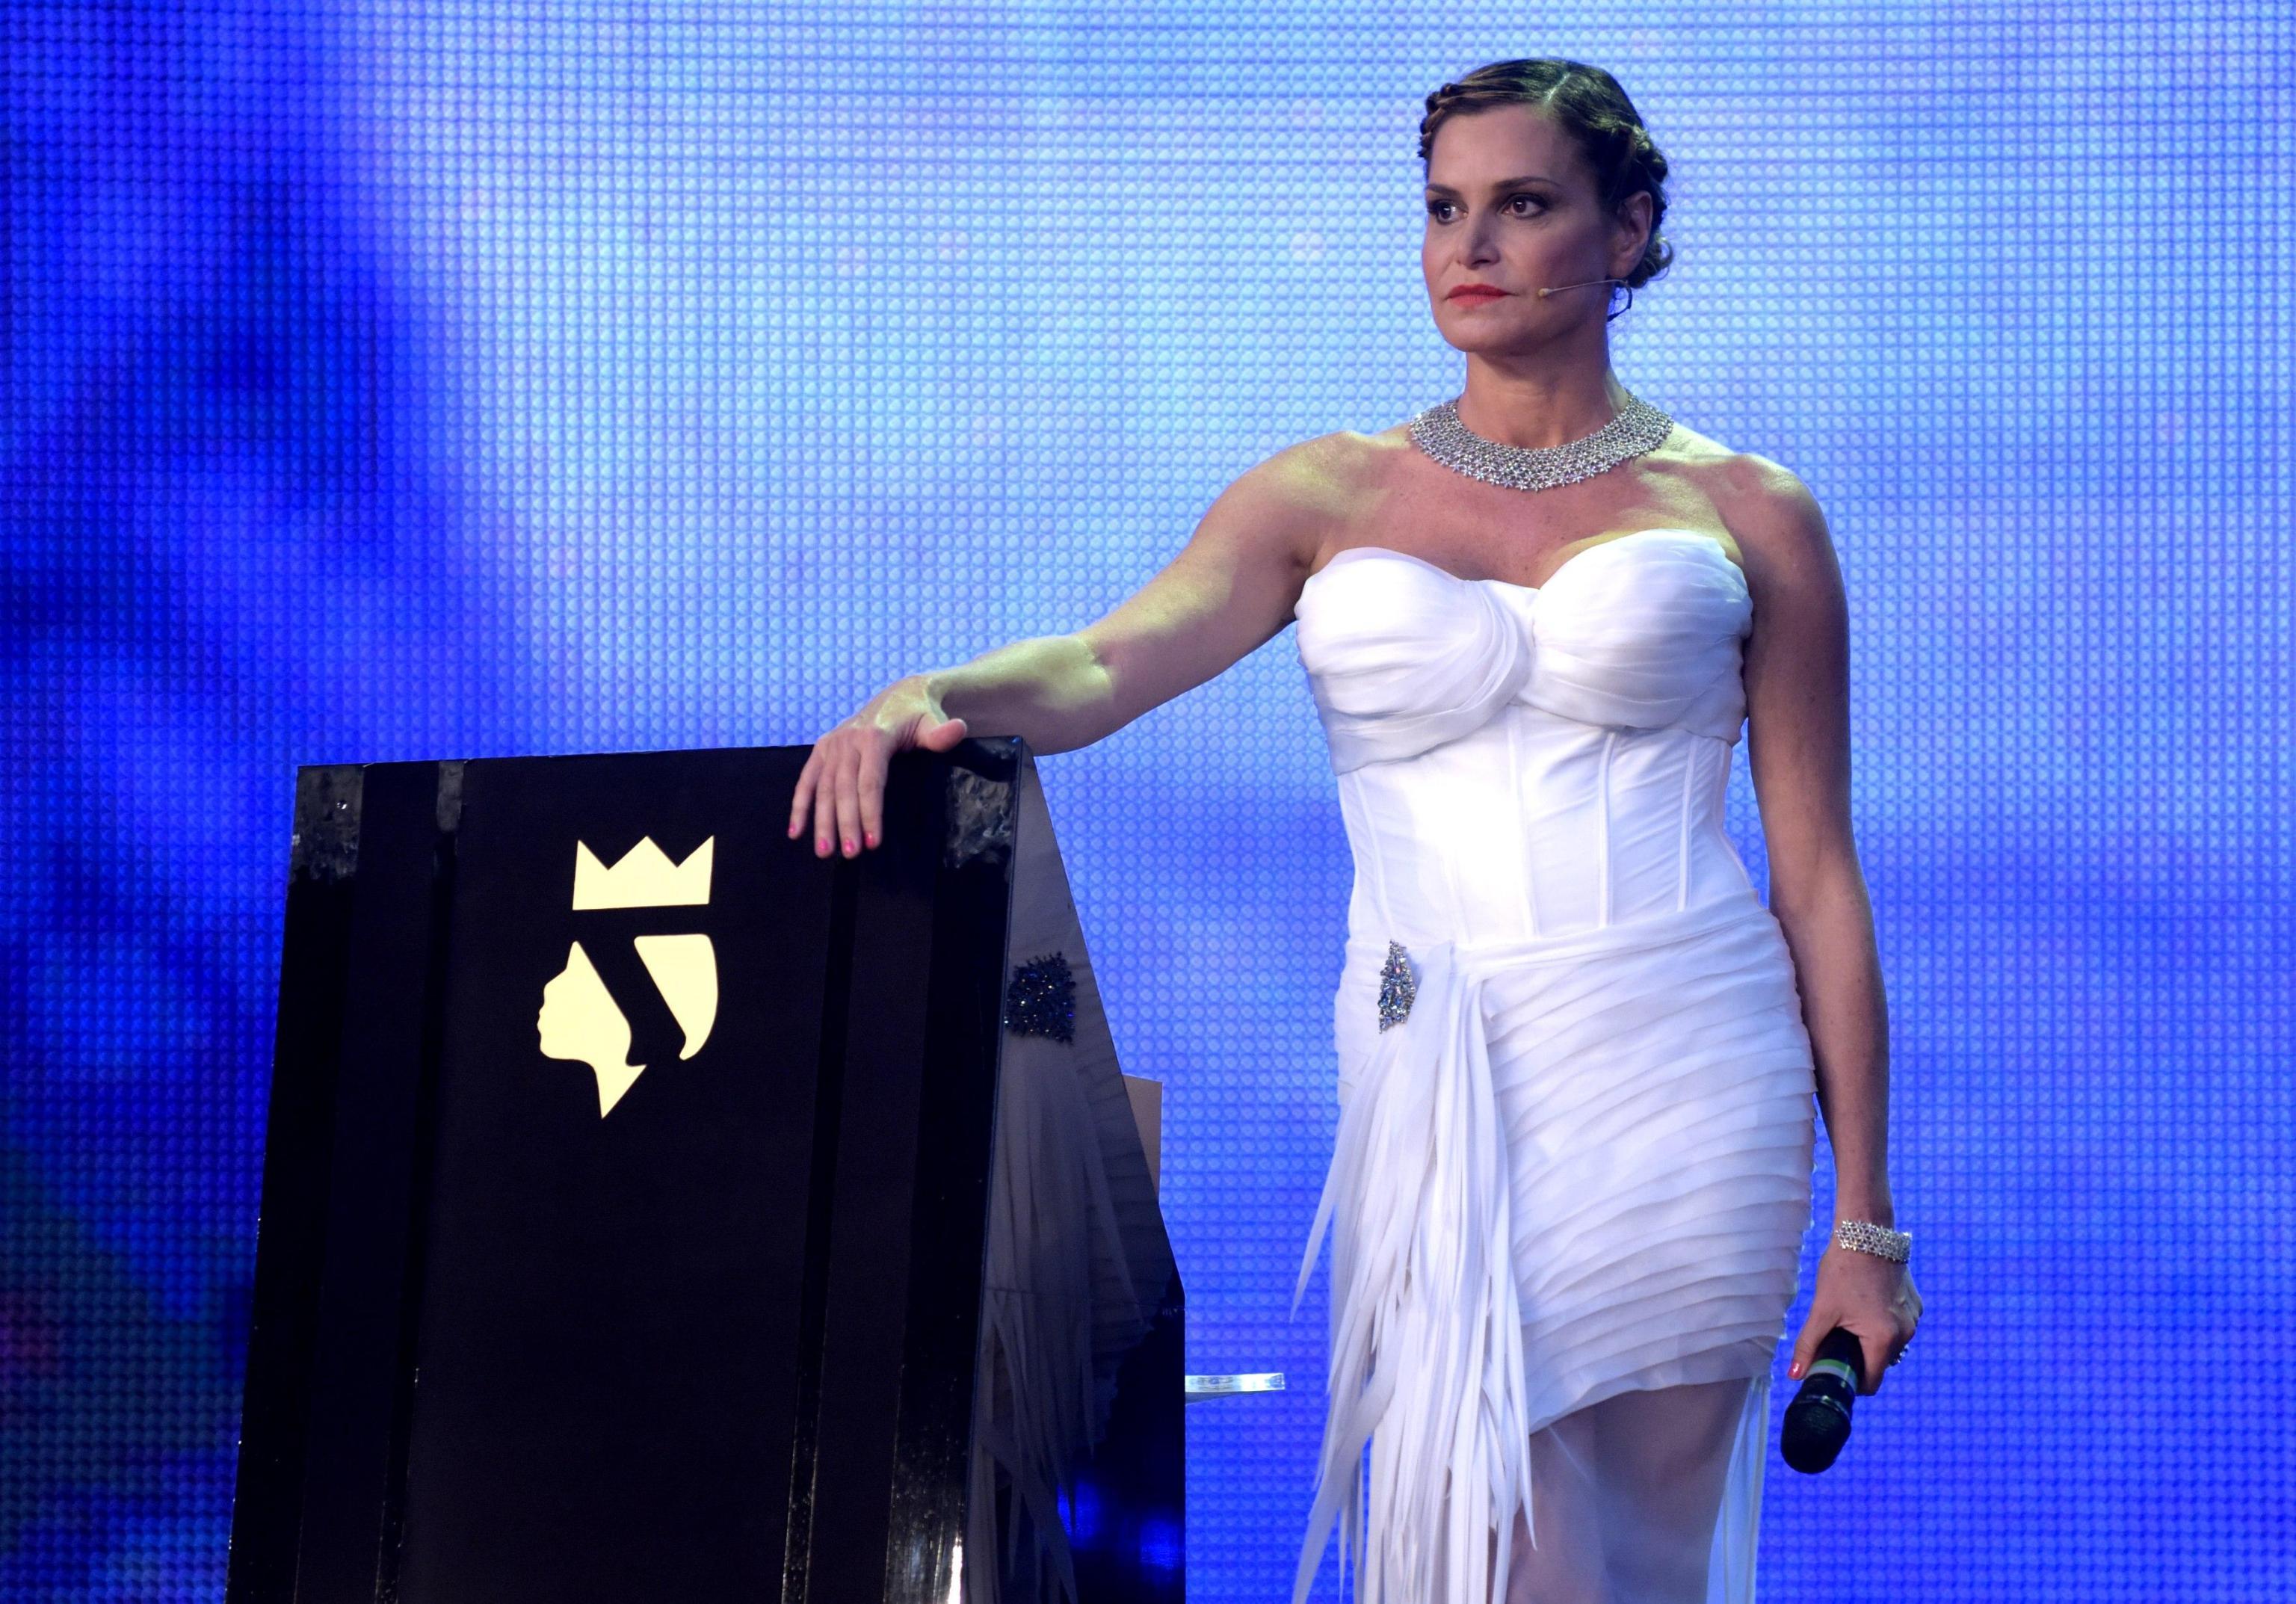 Simona Ventura, dalla tv all'amore: 'Riparto a testa bassa. Gerò Carraro? Un dono dal cielo'